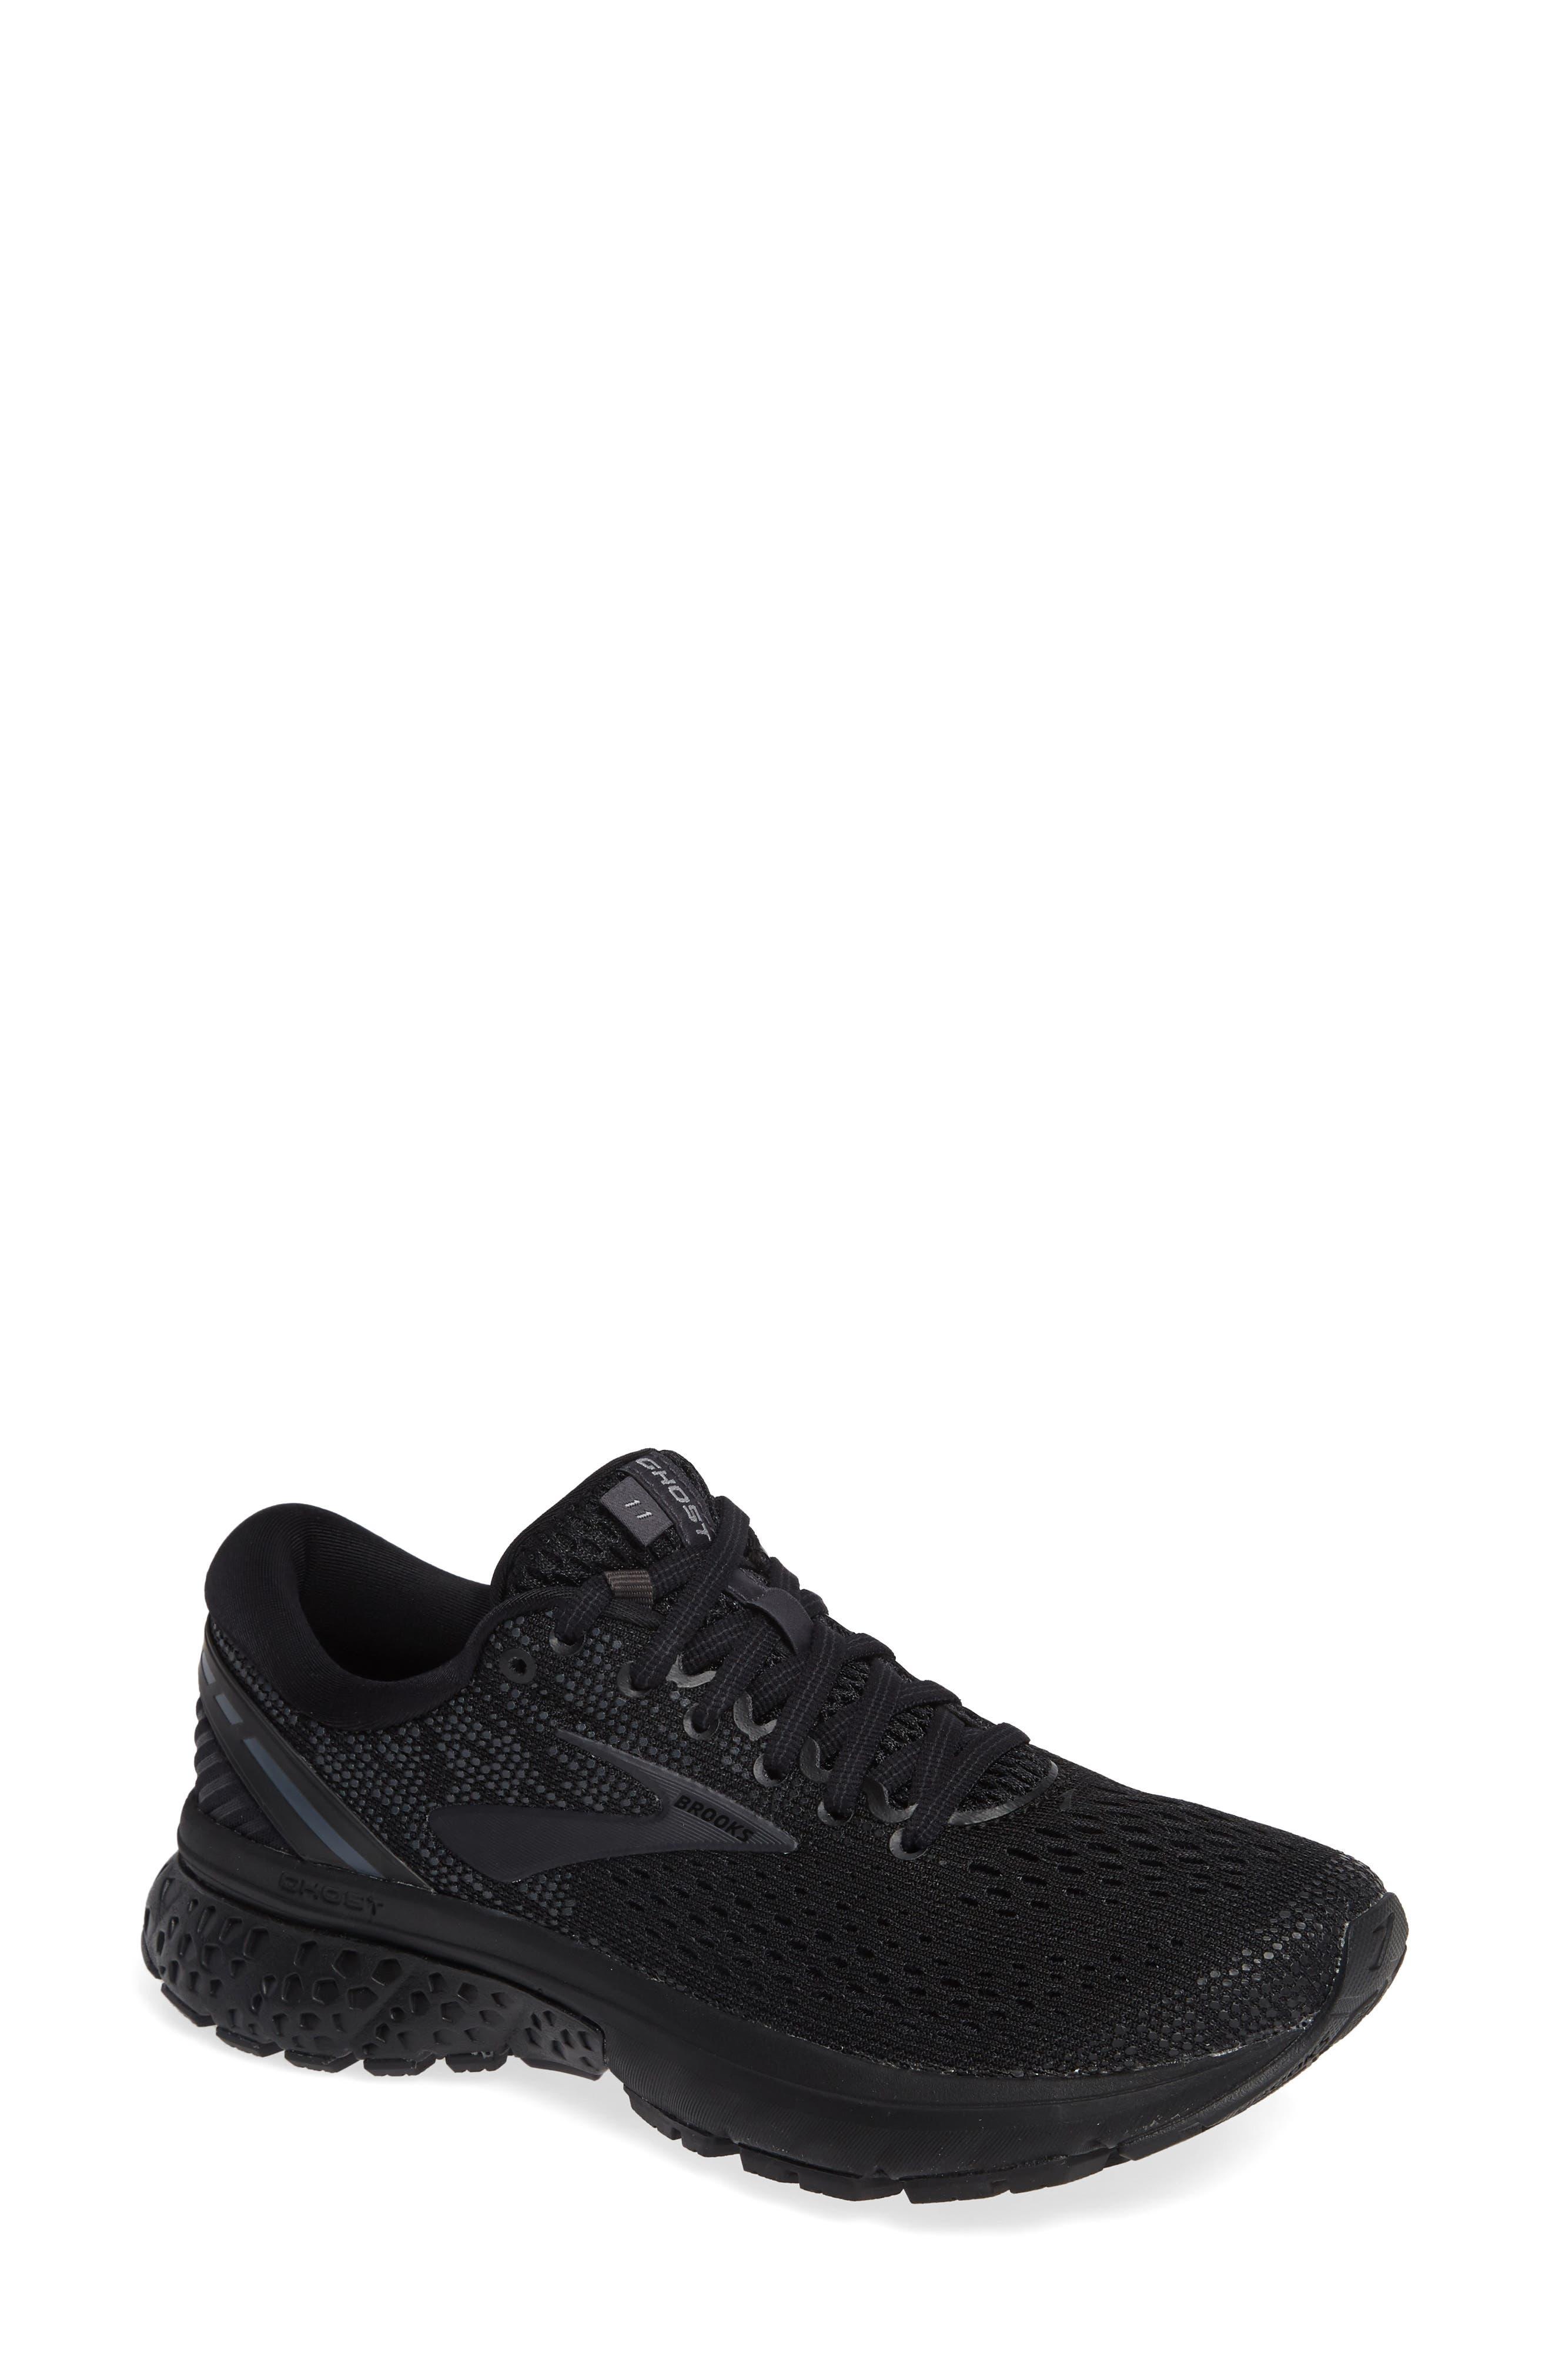 BROOKS, Ghost 11 Running Shoe, Main thumbnail 1, color, BLACK/ EBONY